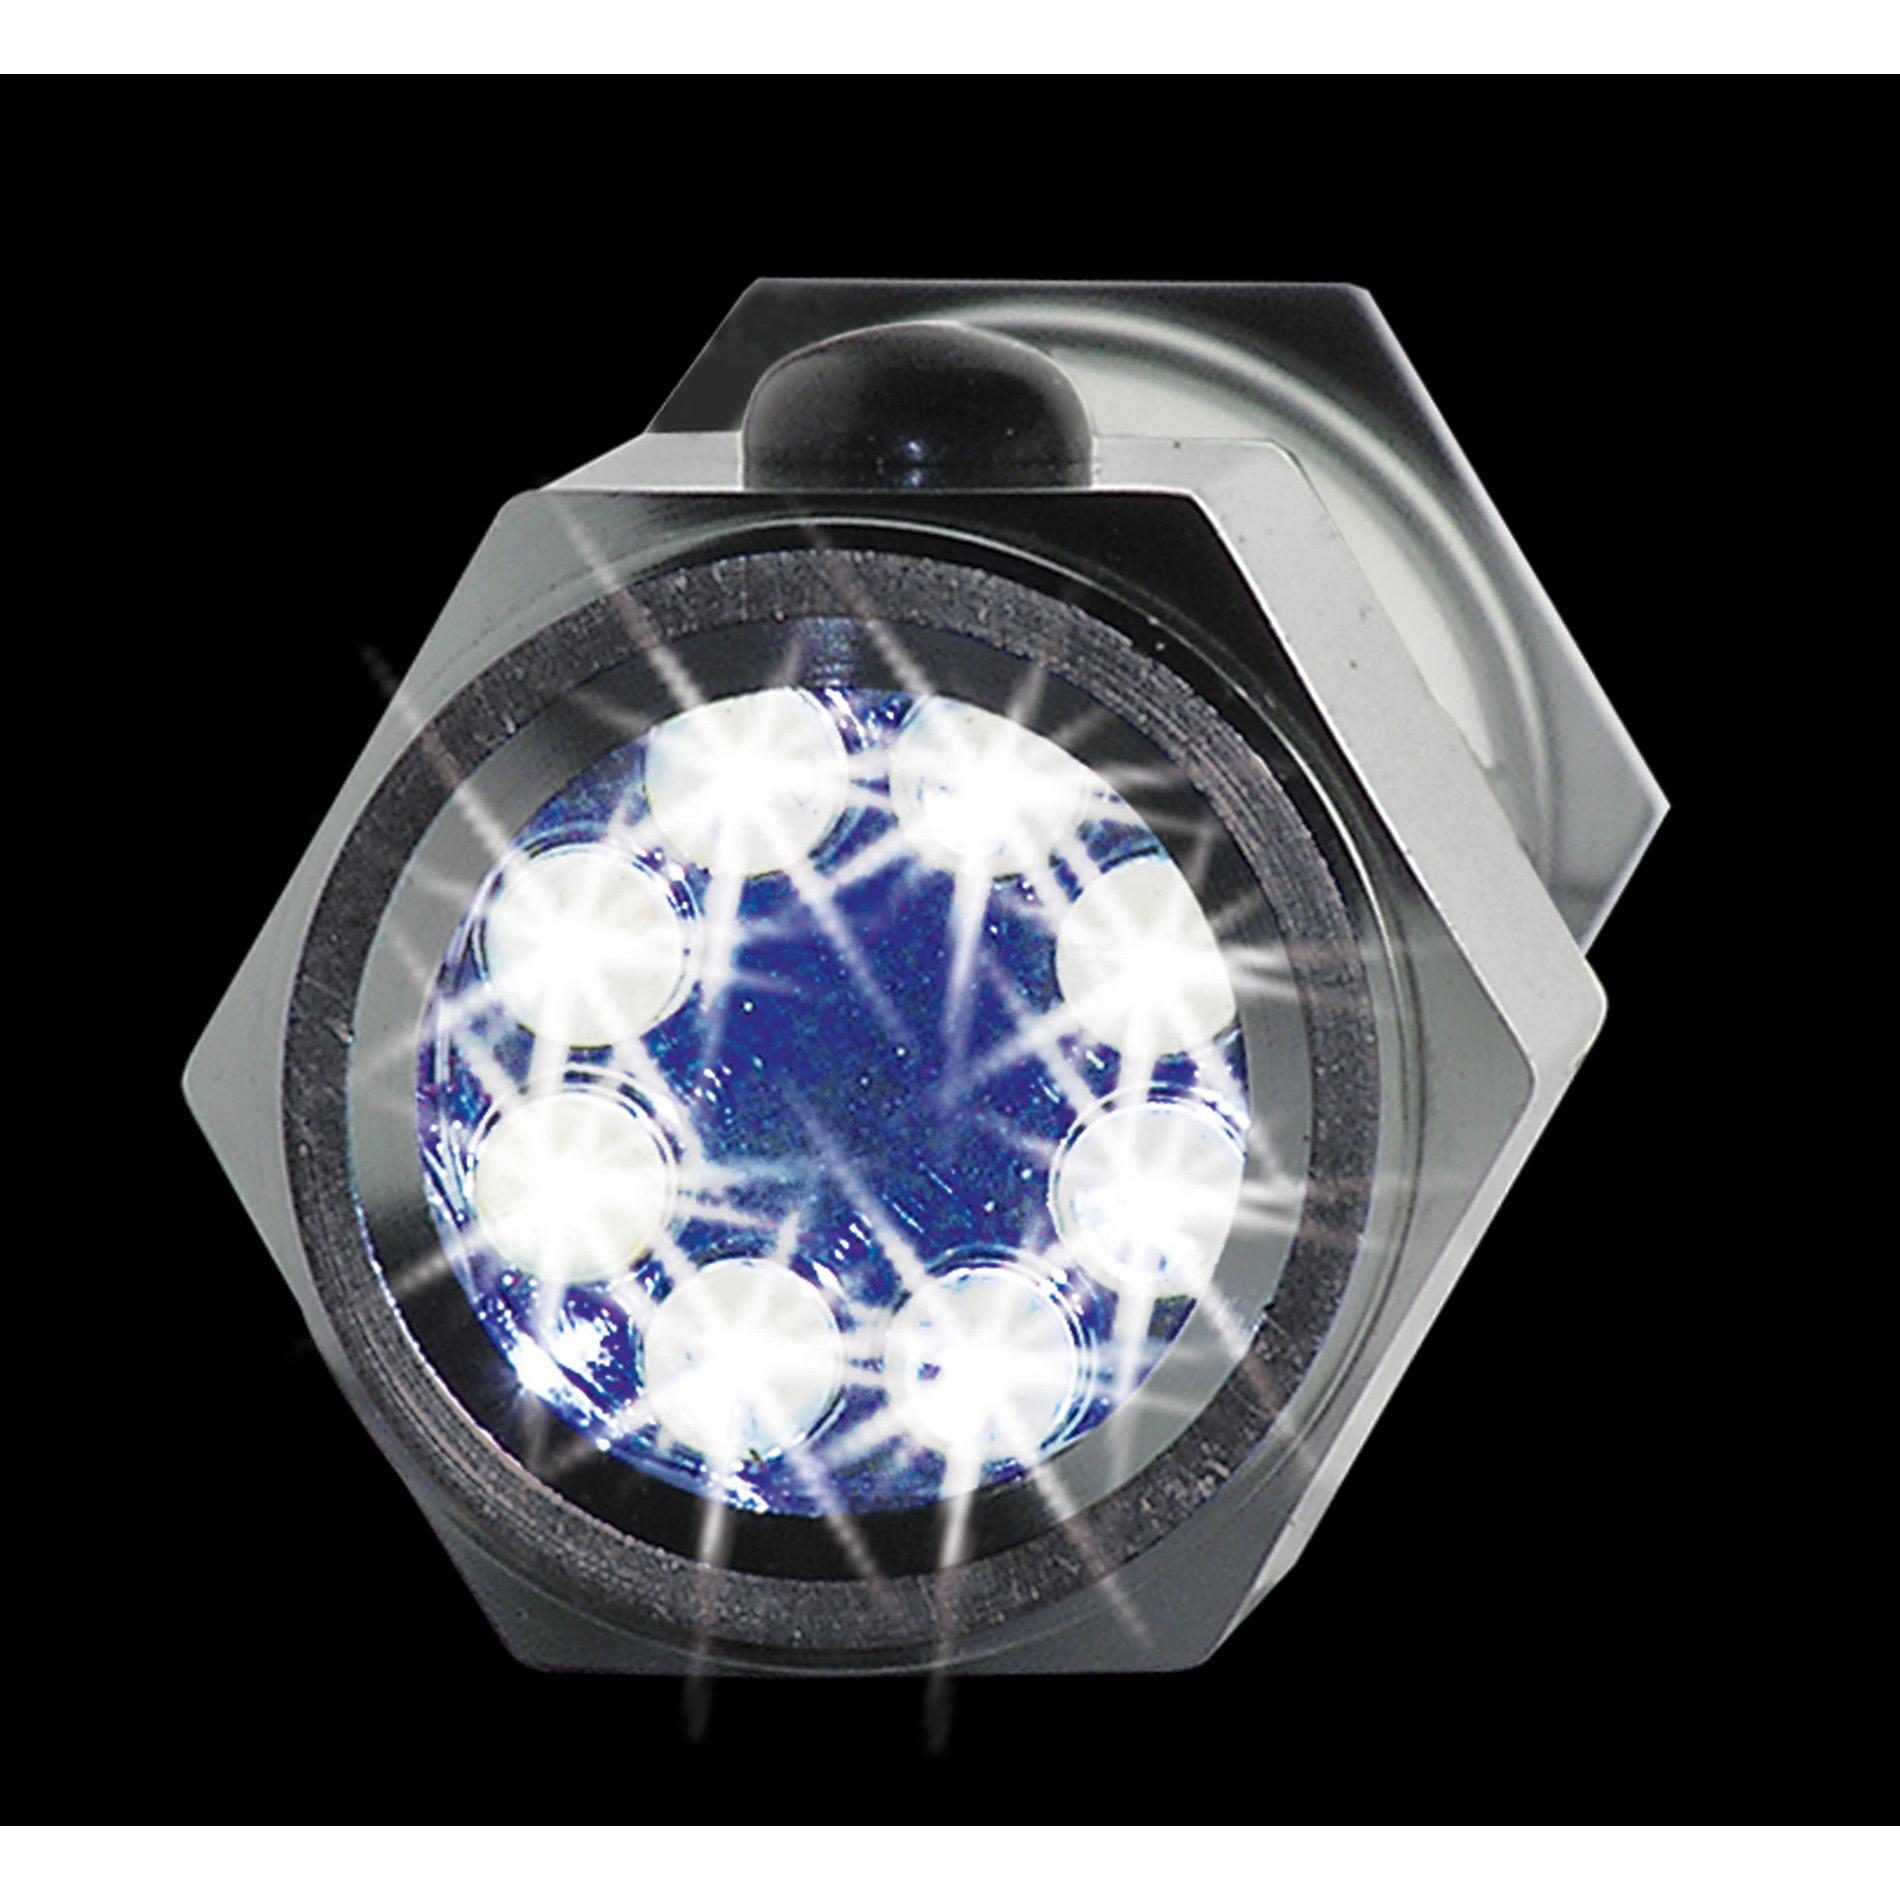 Flashlight / Emergency Tool